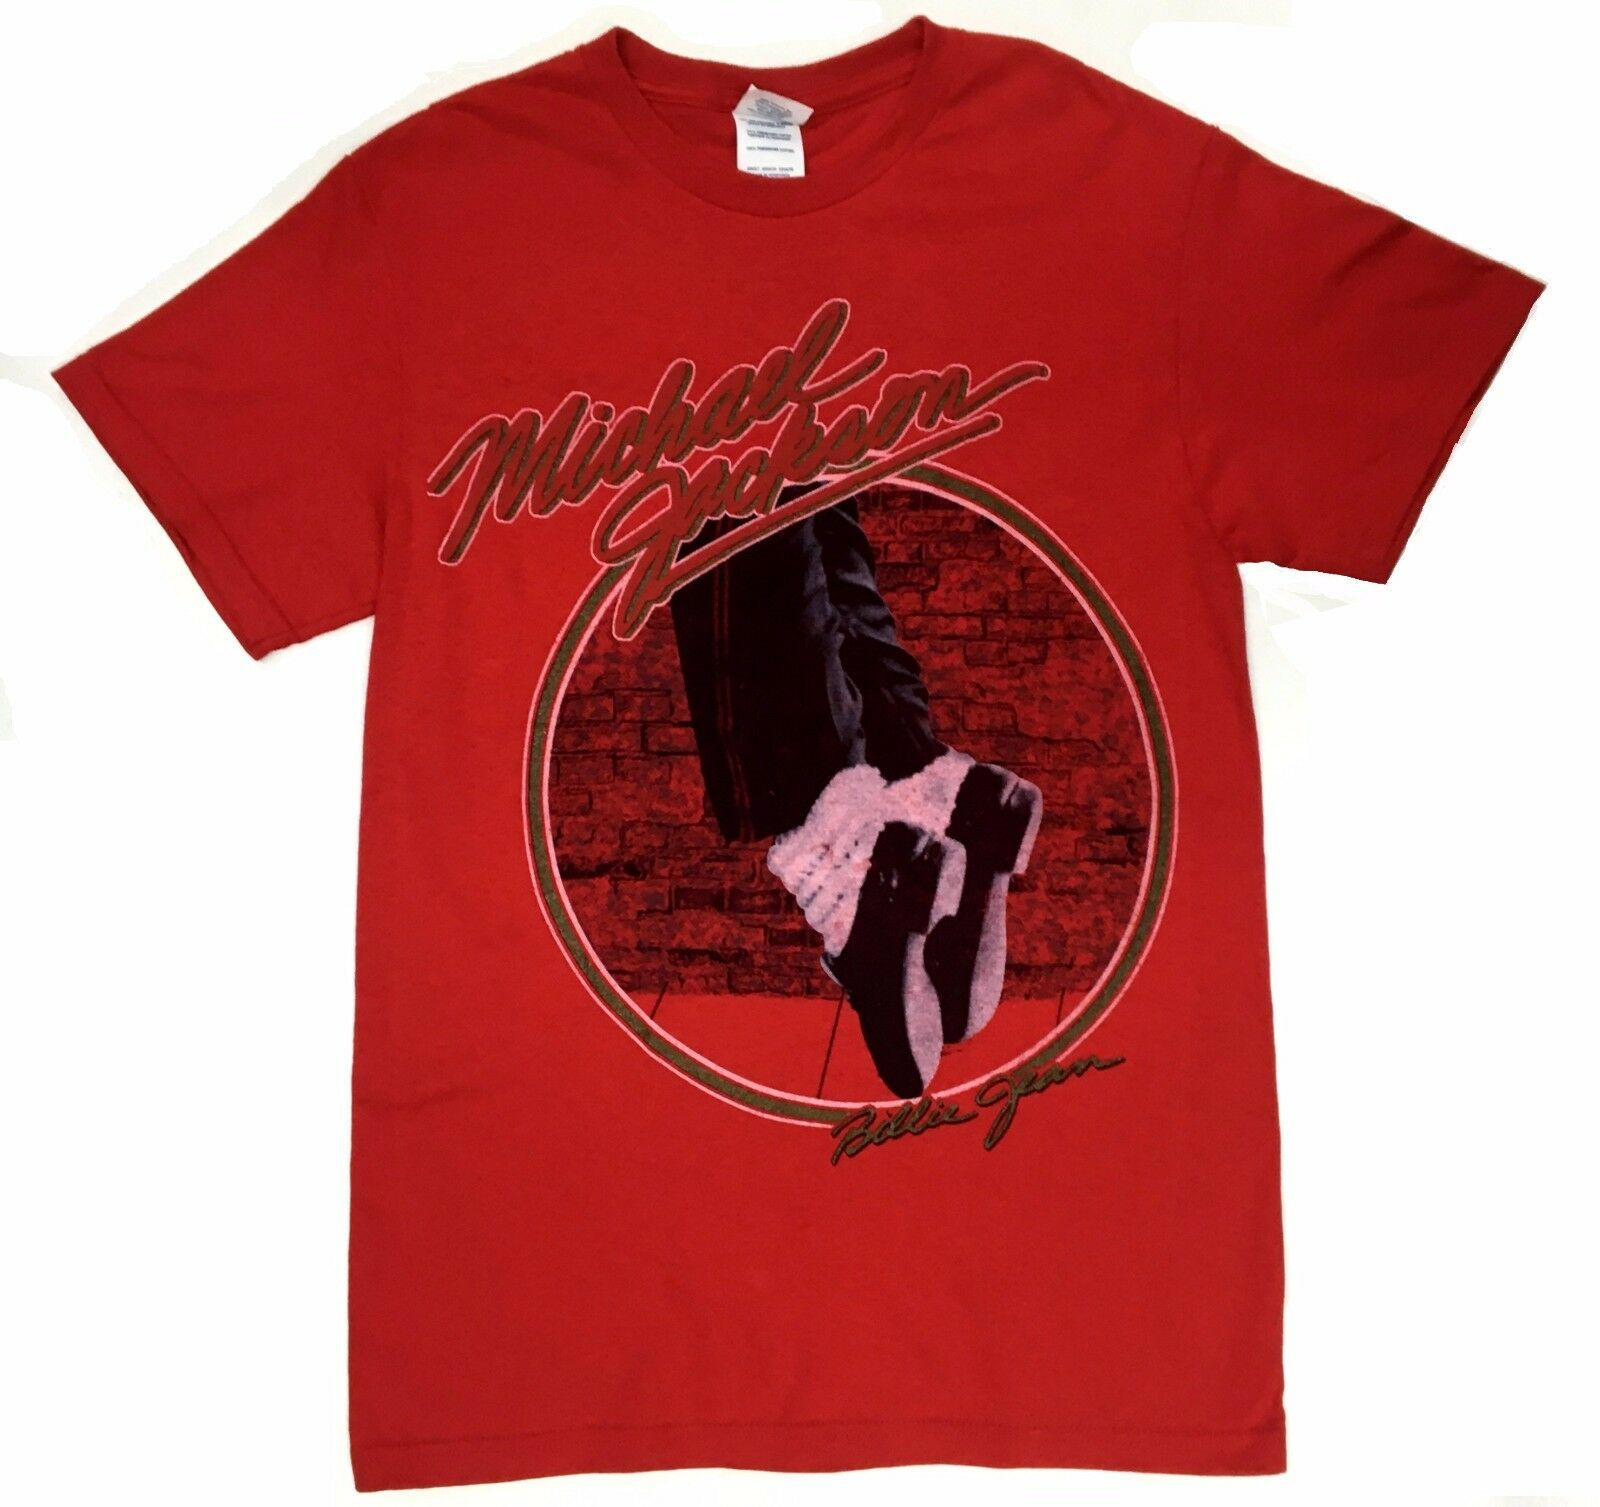 ¡Michael Jackson Billie Jean Moon Walker camiseta S-2Xl 100% auténtico raro!